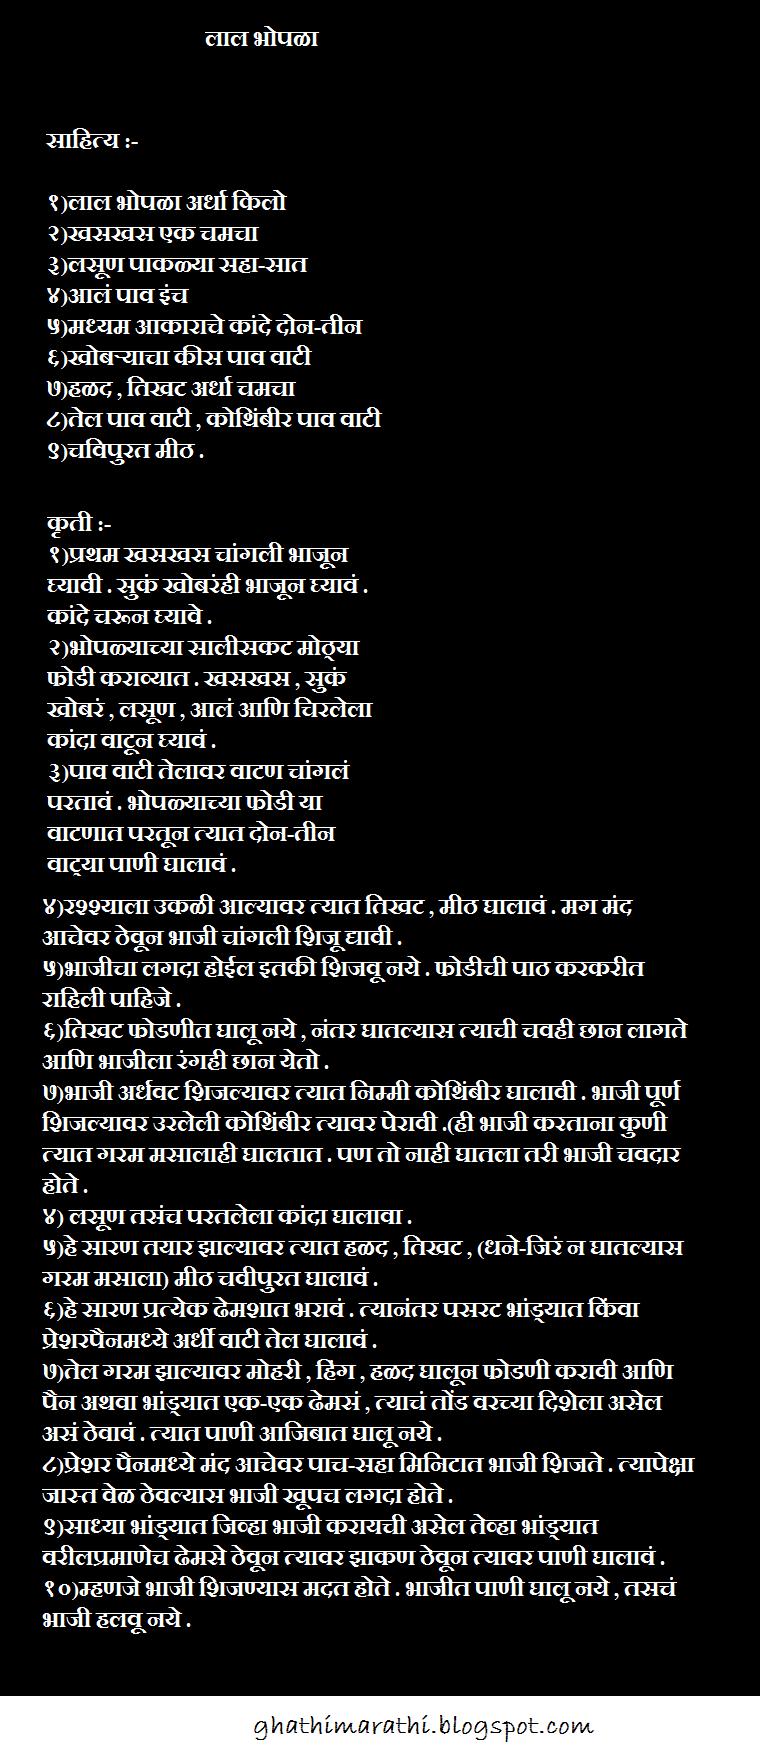 Lal bhopla marathi recipes pinterest regional recipes and food all marathi recipes forumfinder Images